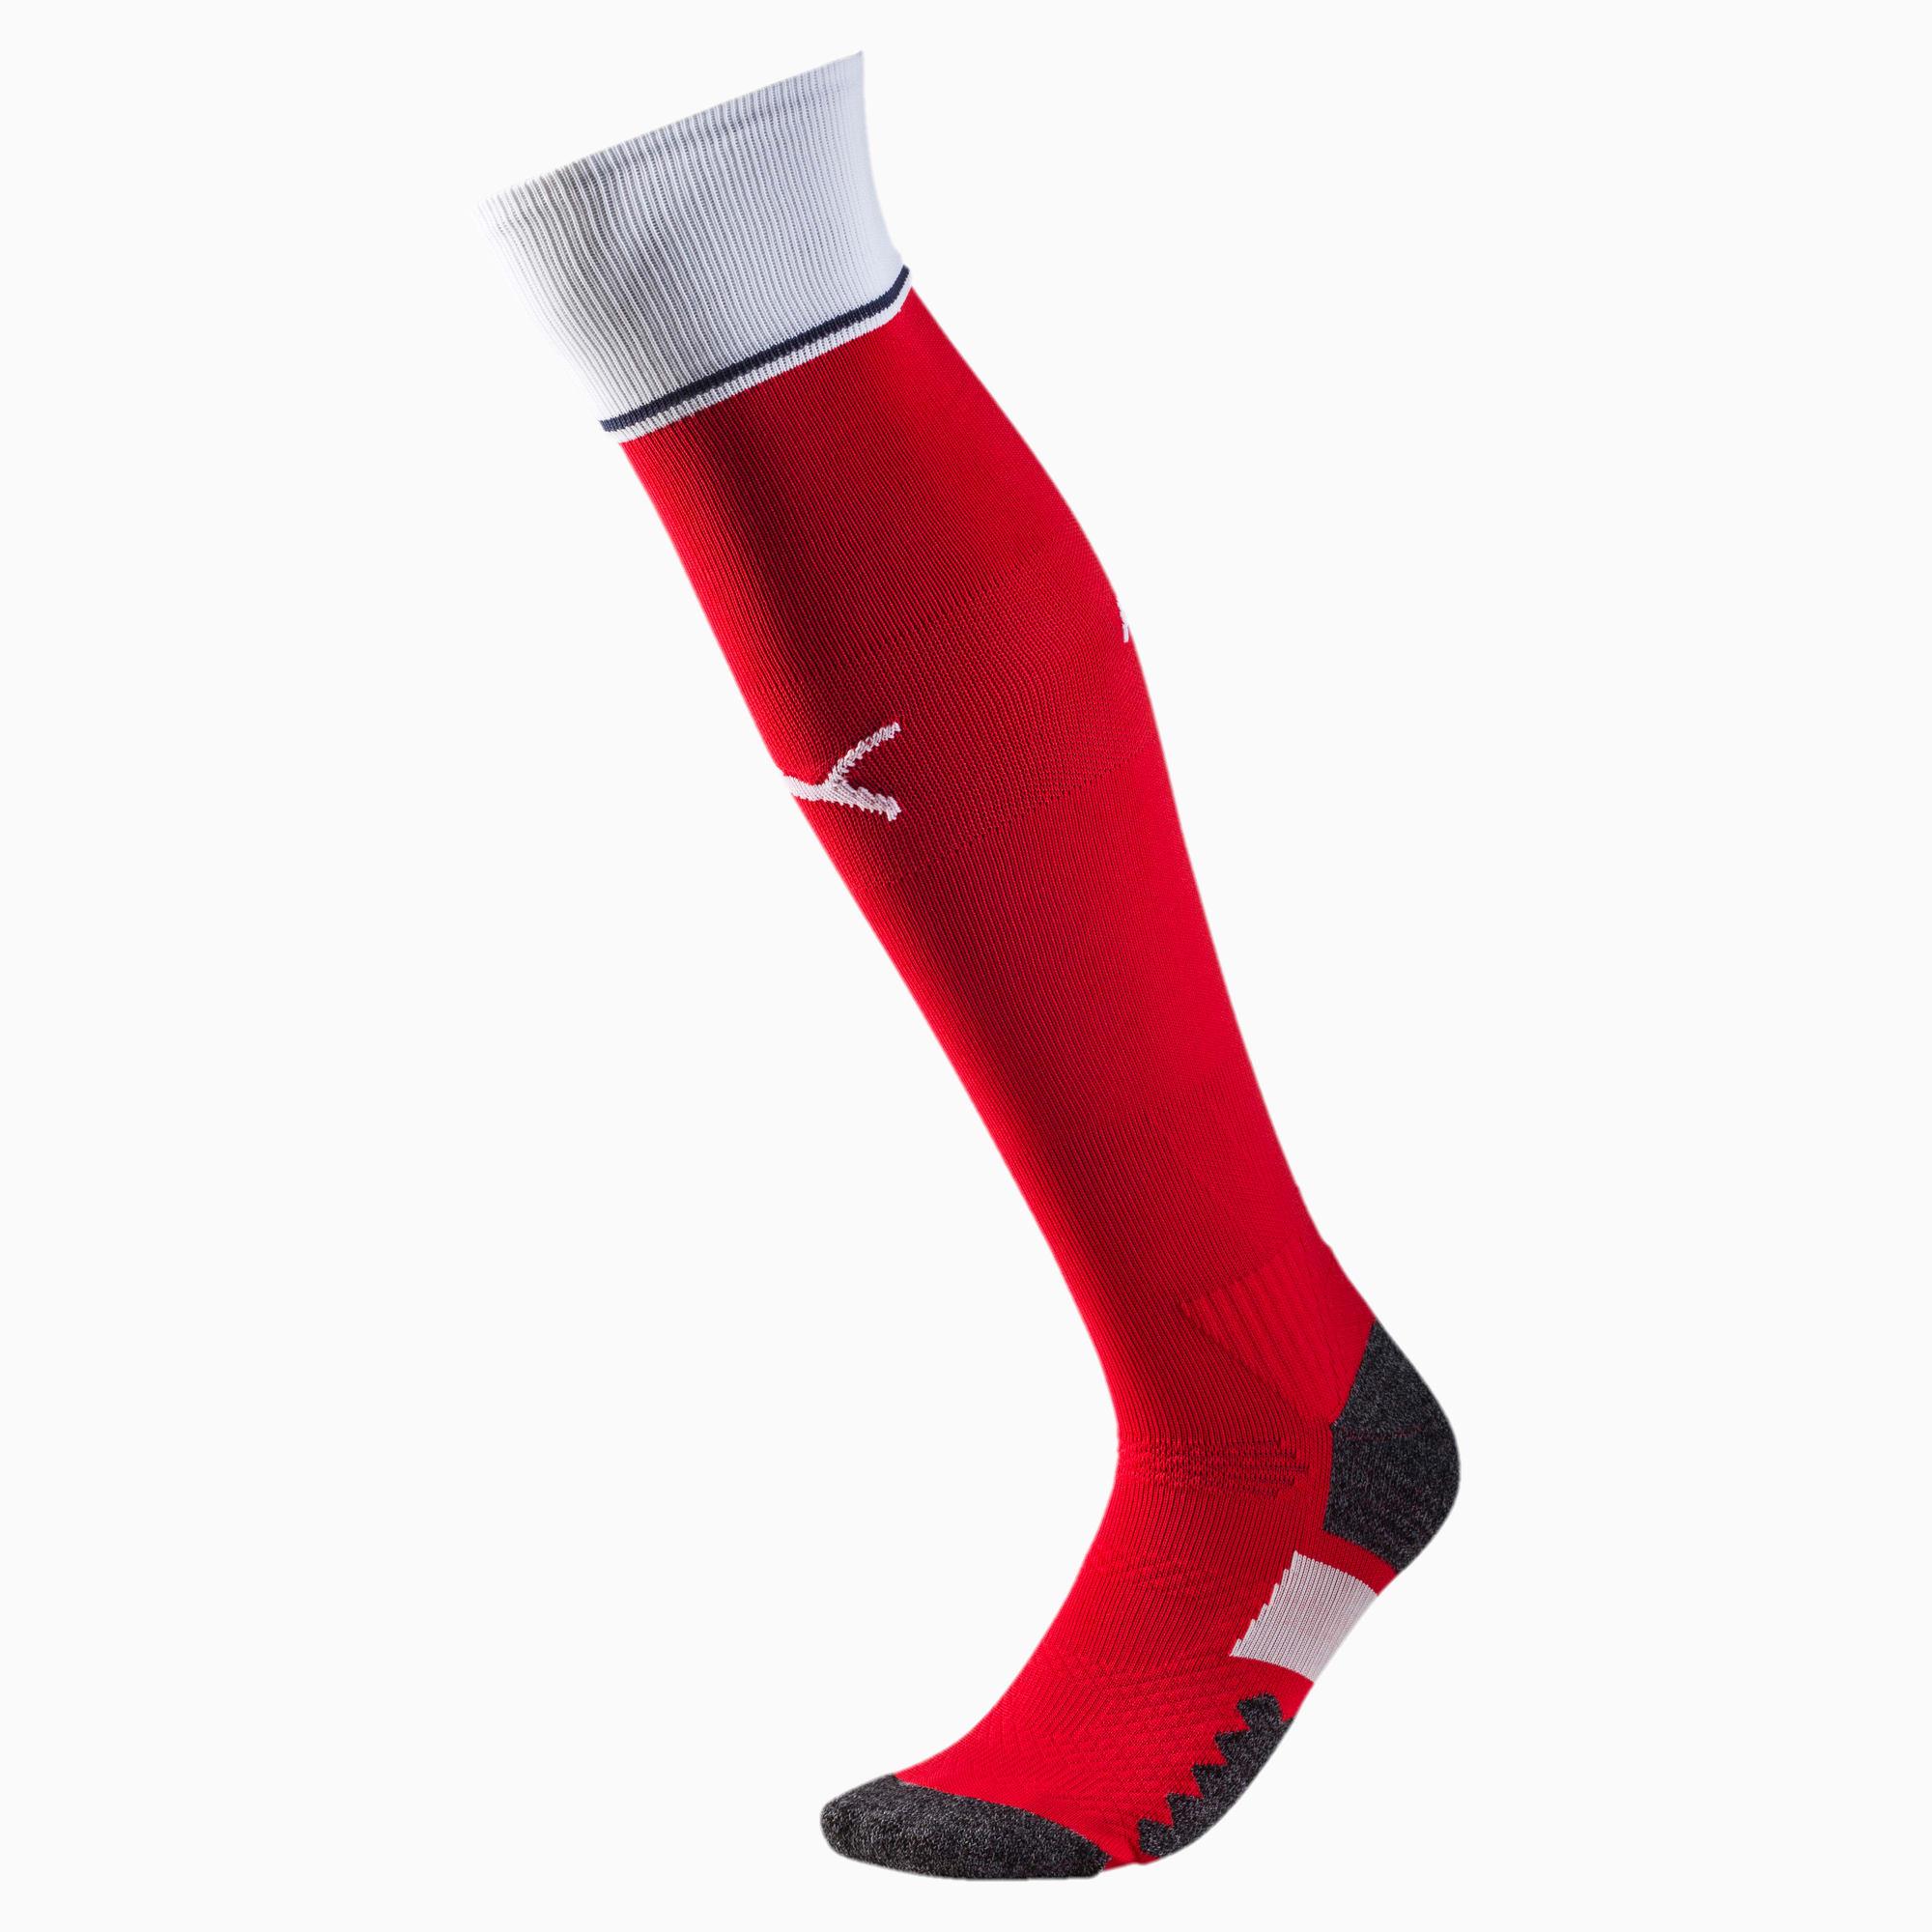 2016/17 Arsenal Striped Soccer Socks